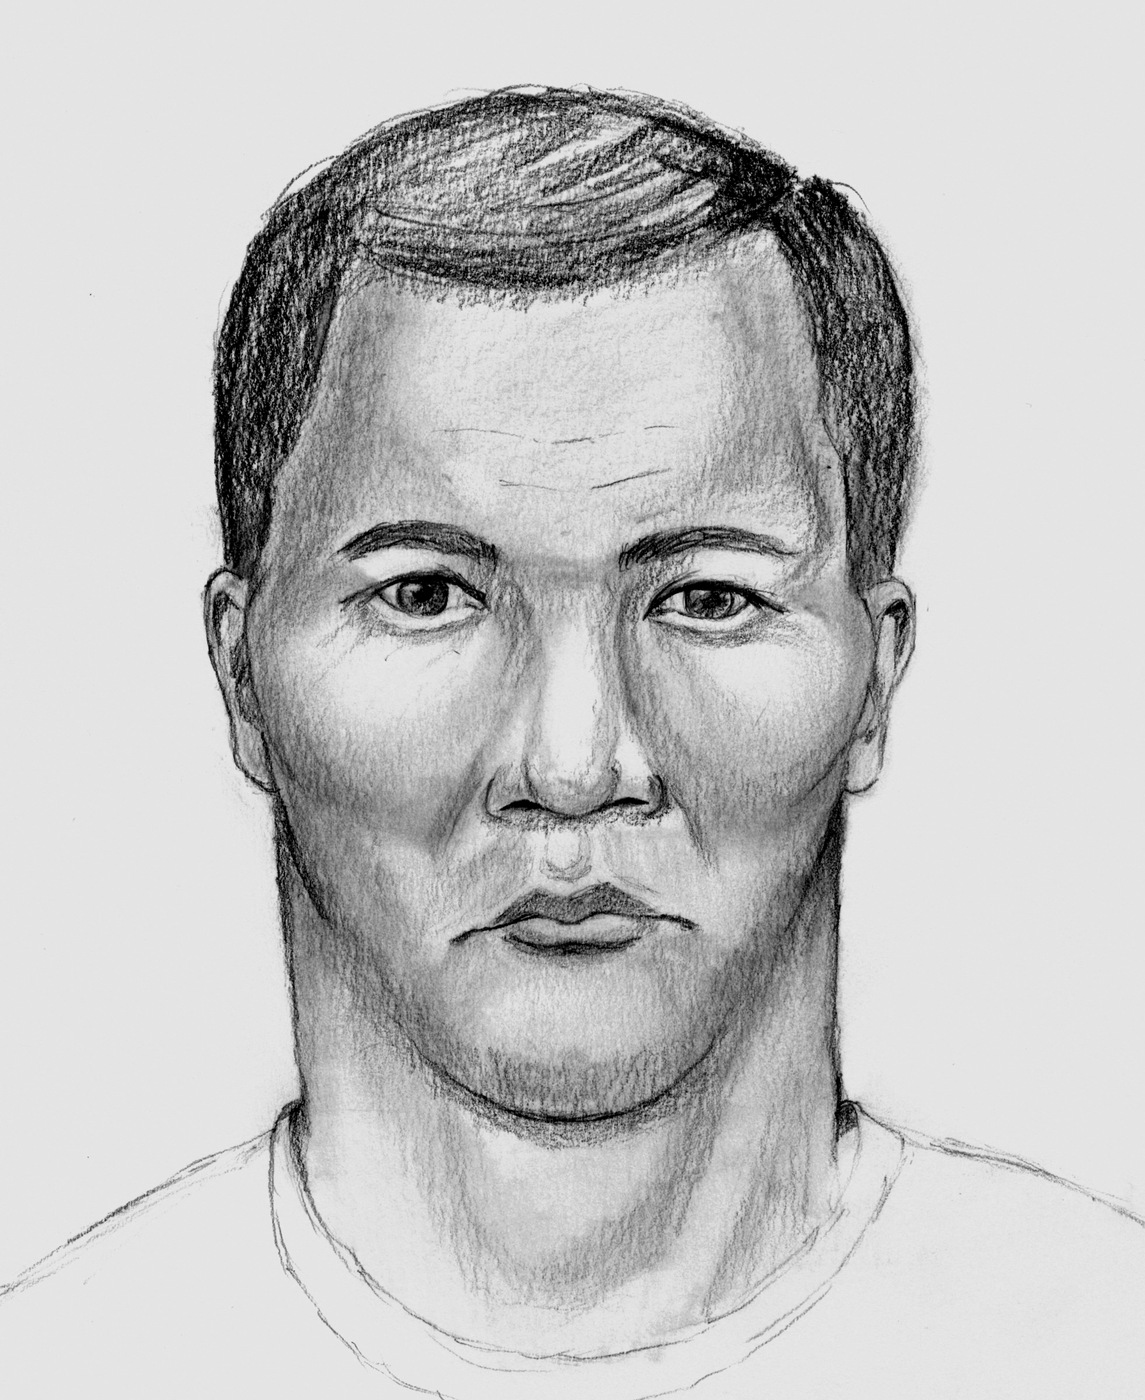 Albuquerque Kidnapping Suspect Sketch